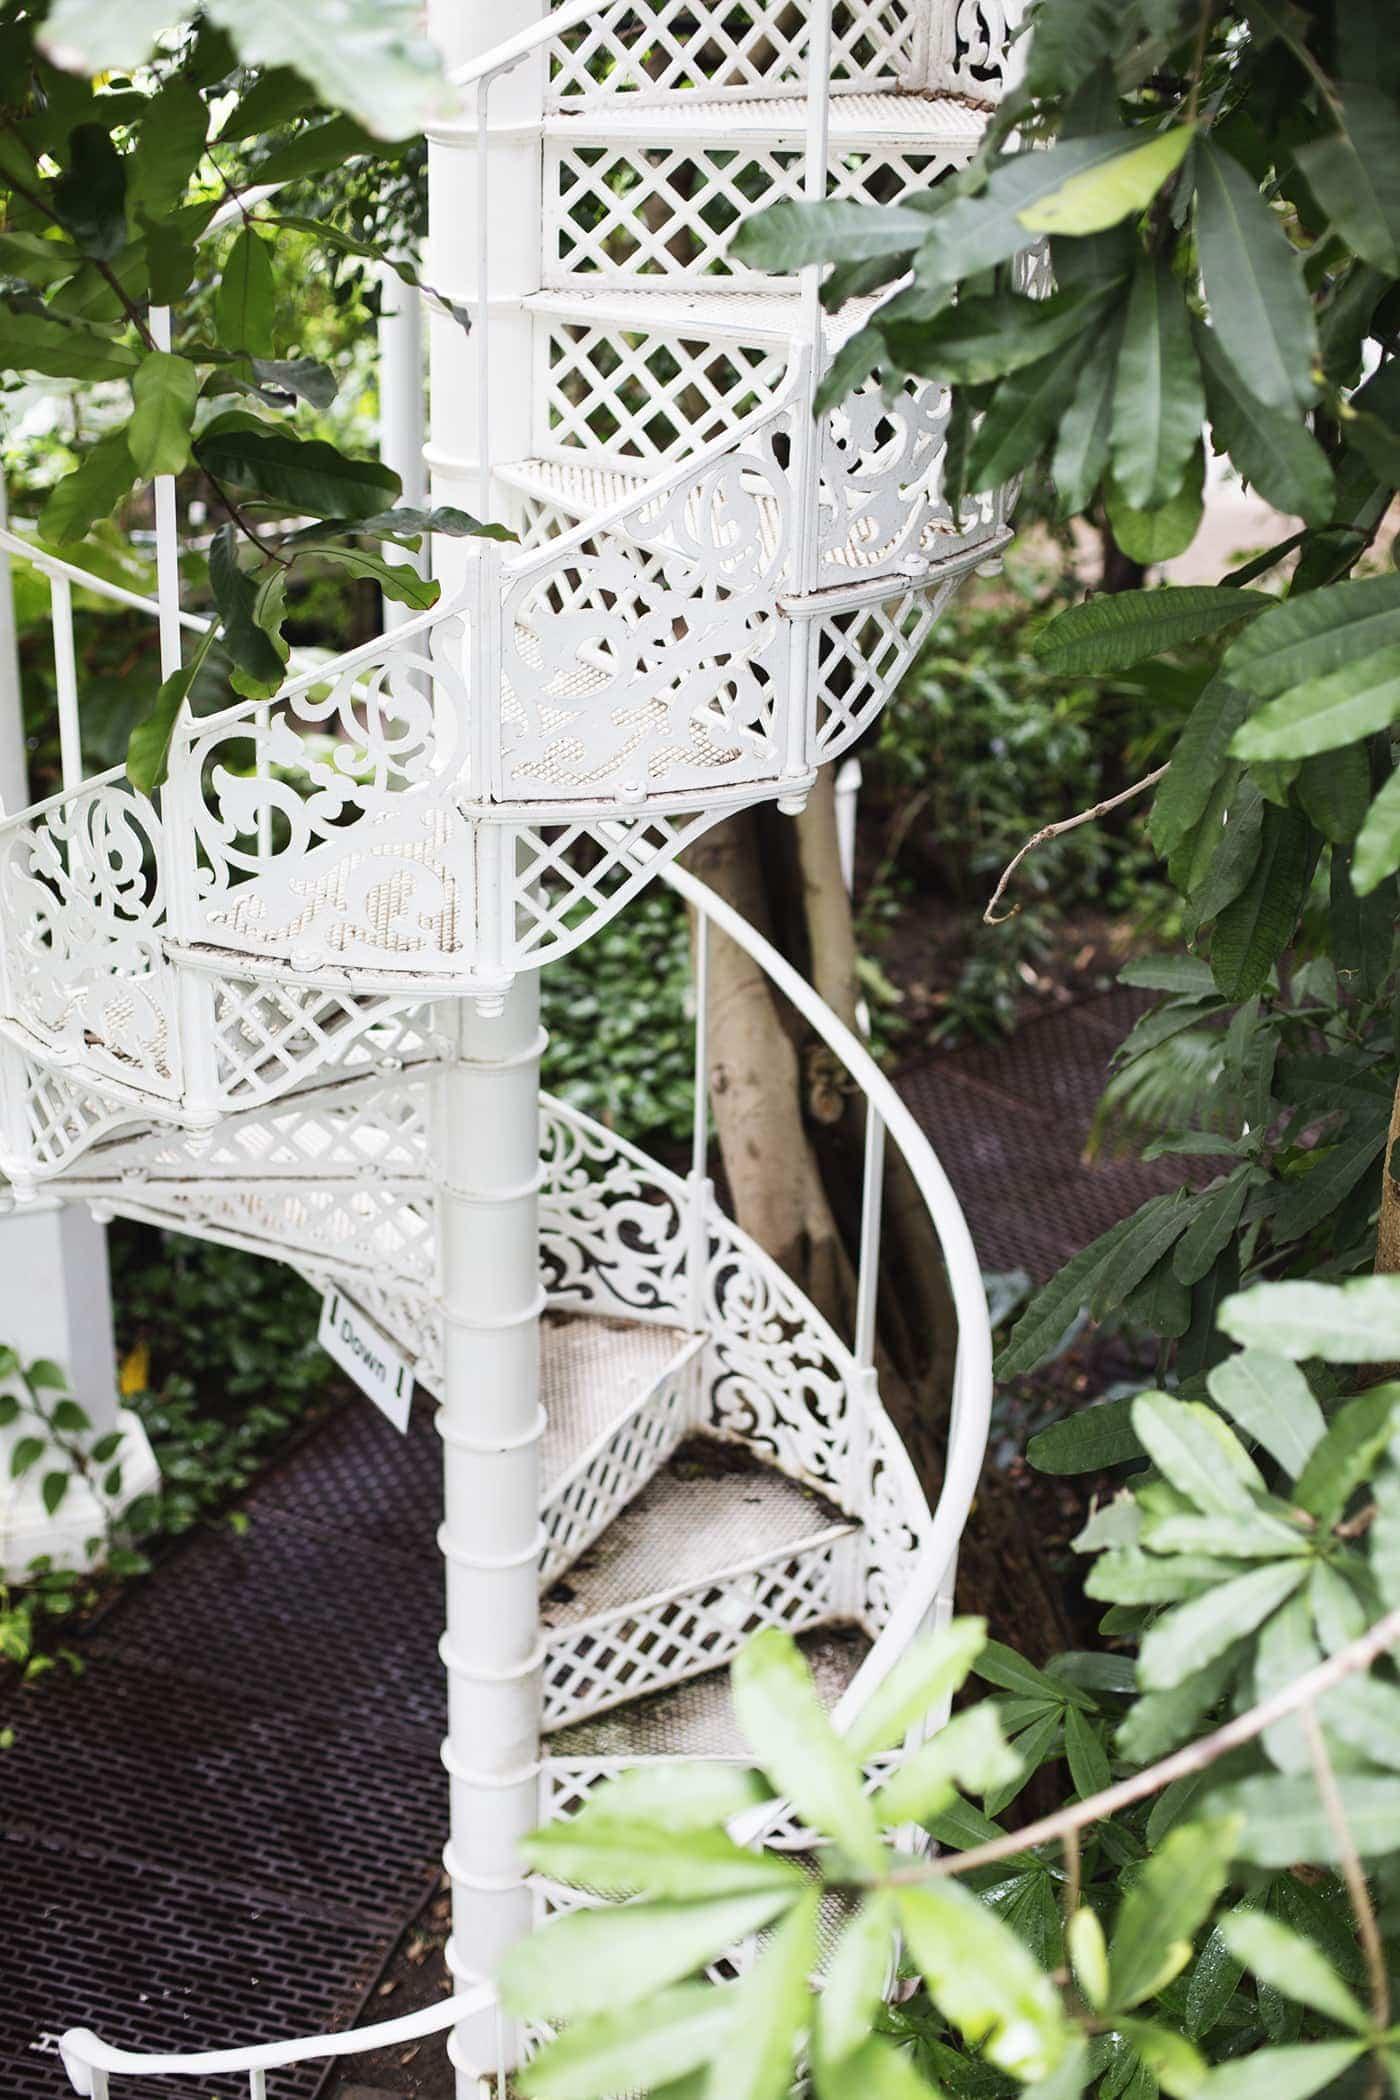 copenhagen-wanderlust-botanical-gardens-5